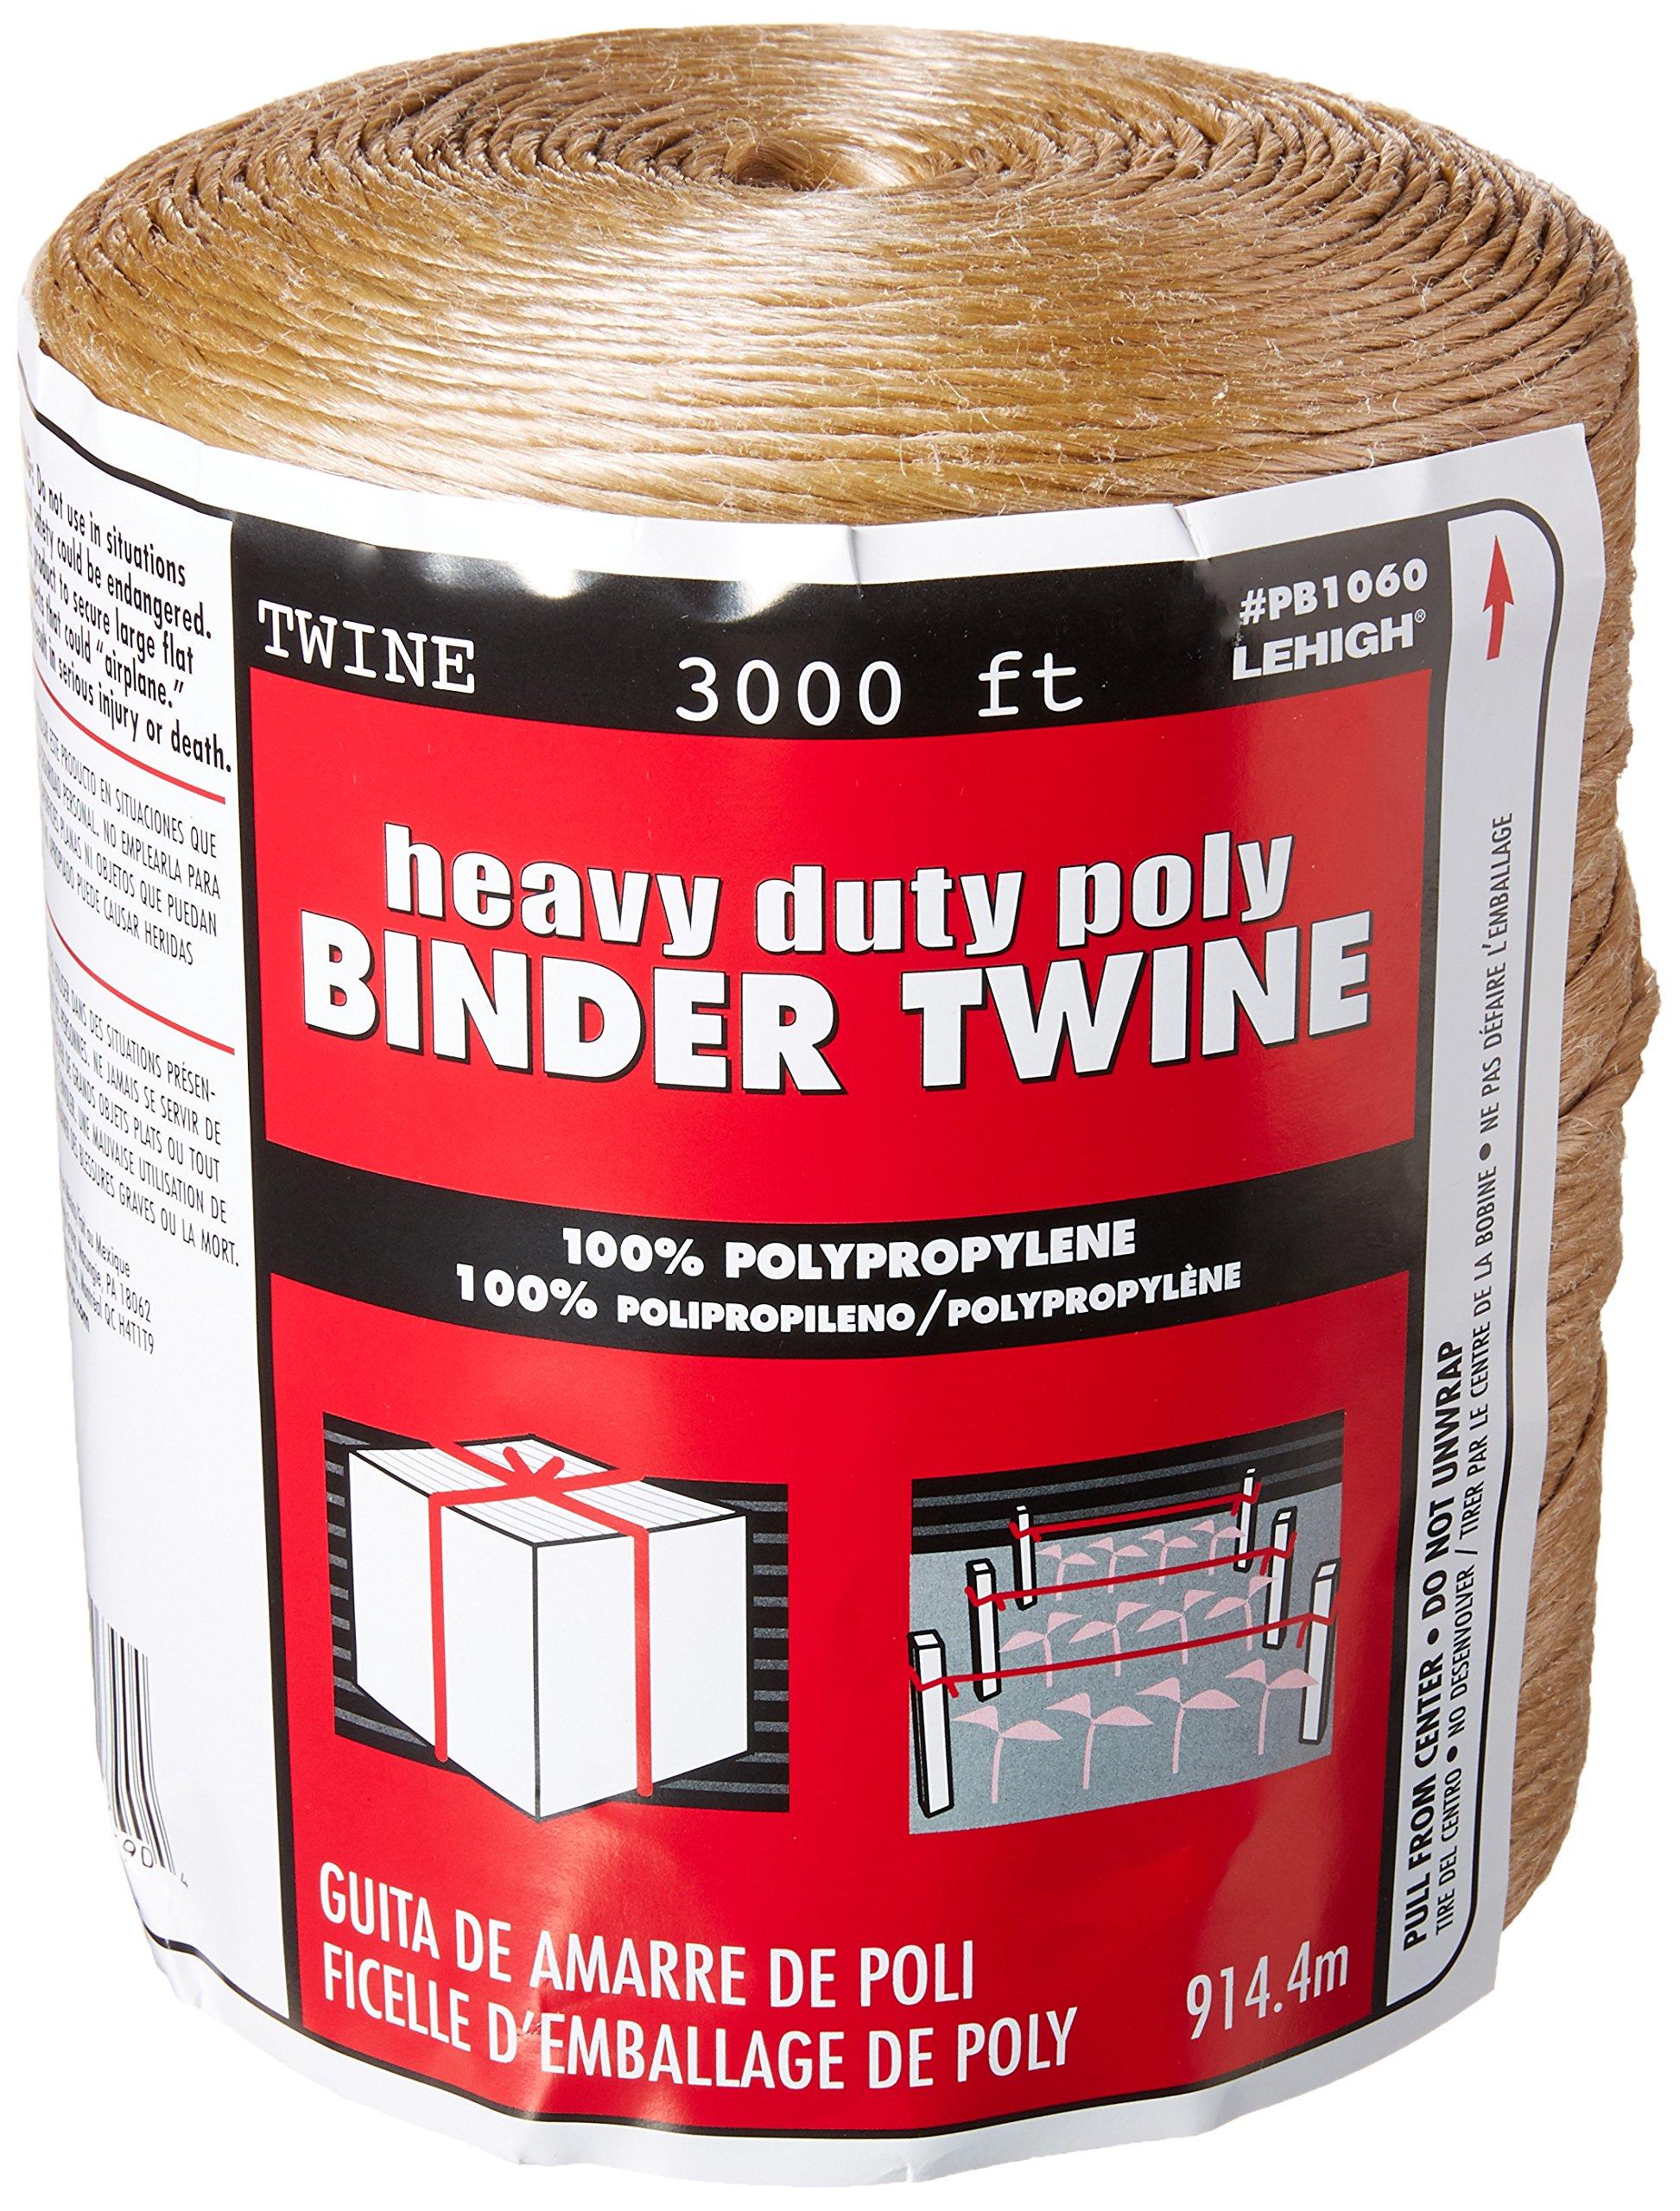 Lehigh Group PB1060 Heavy Duty Poly Binder Twine by The Lehigh Group